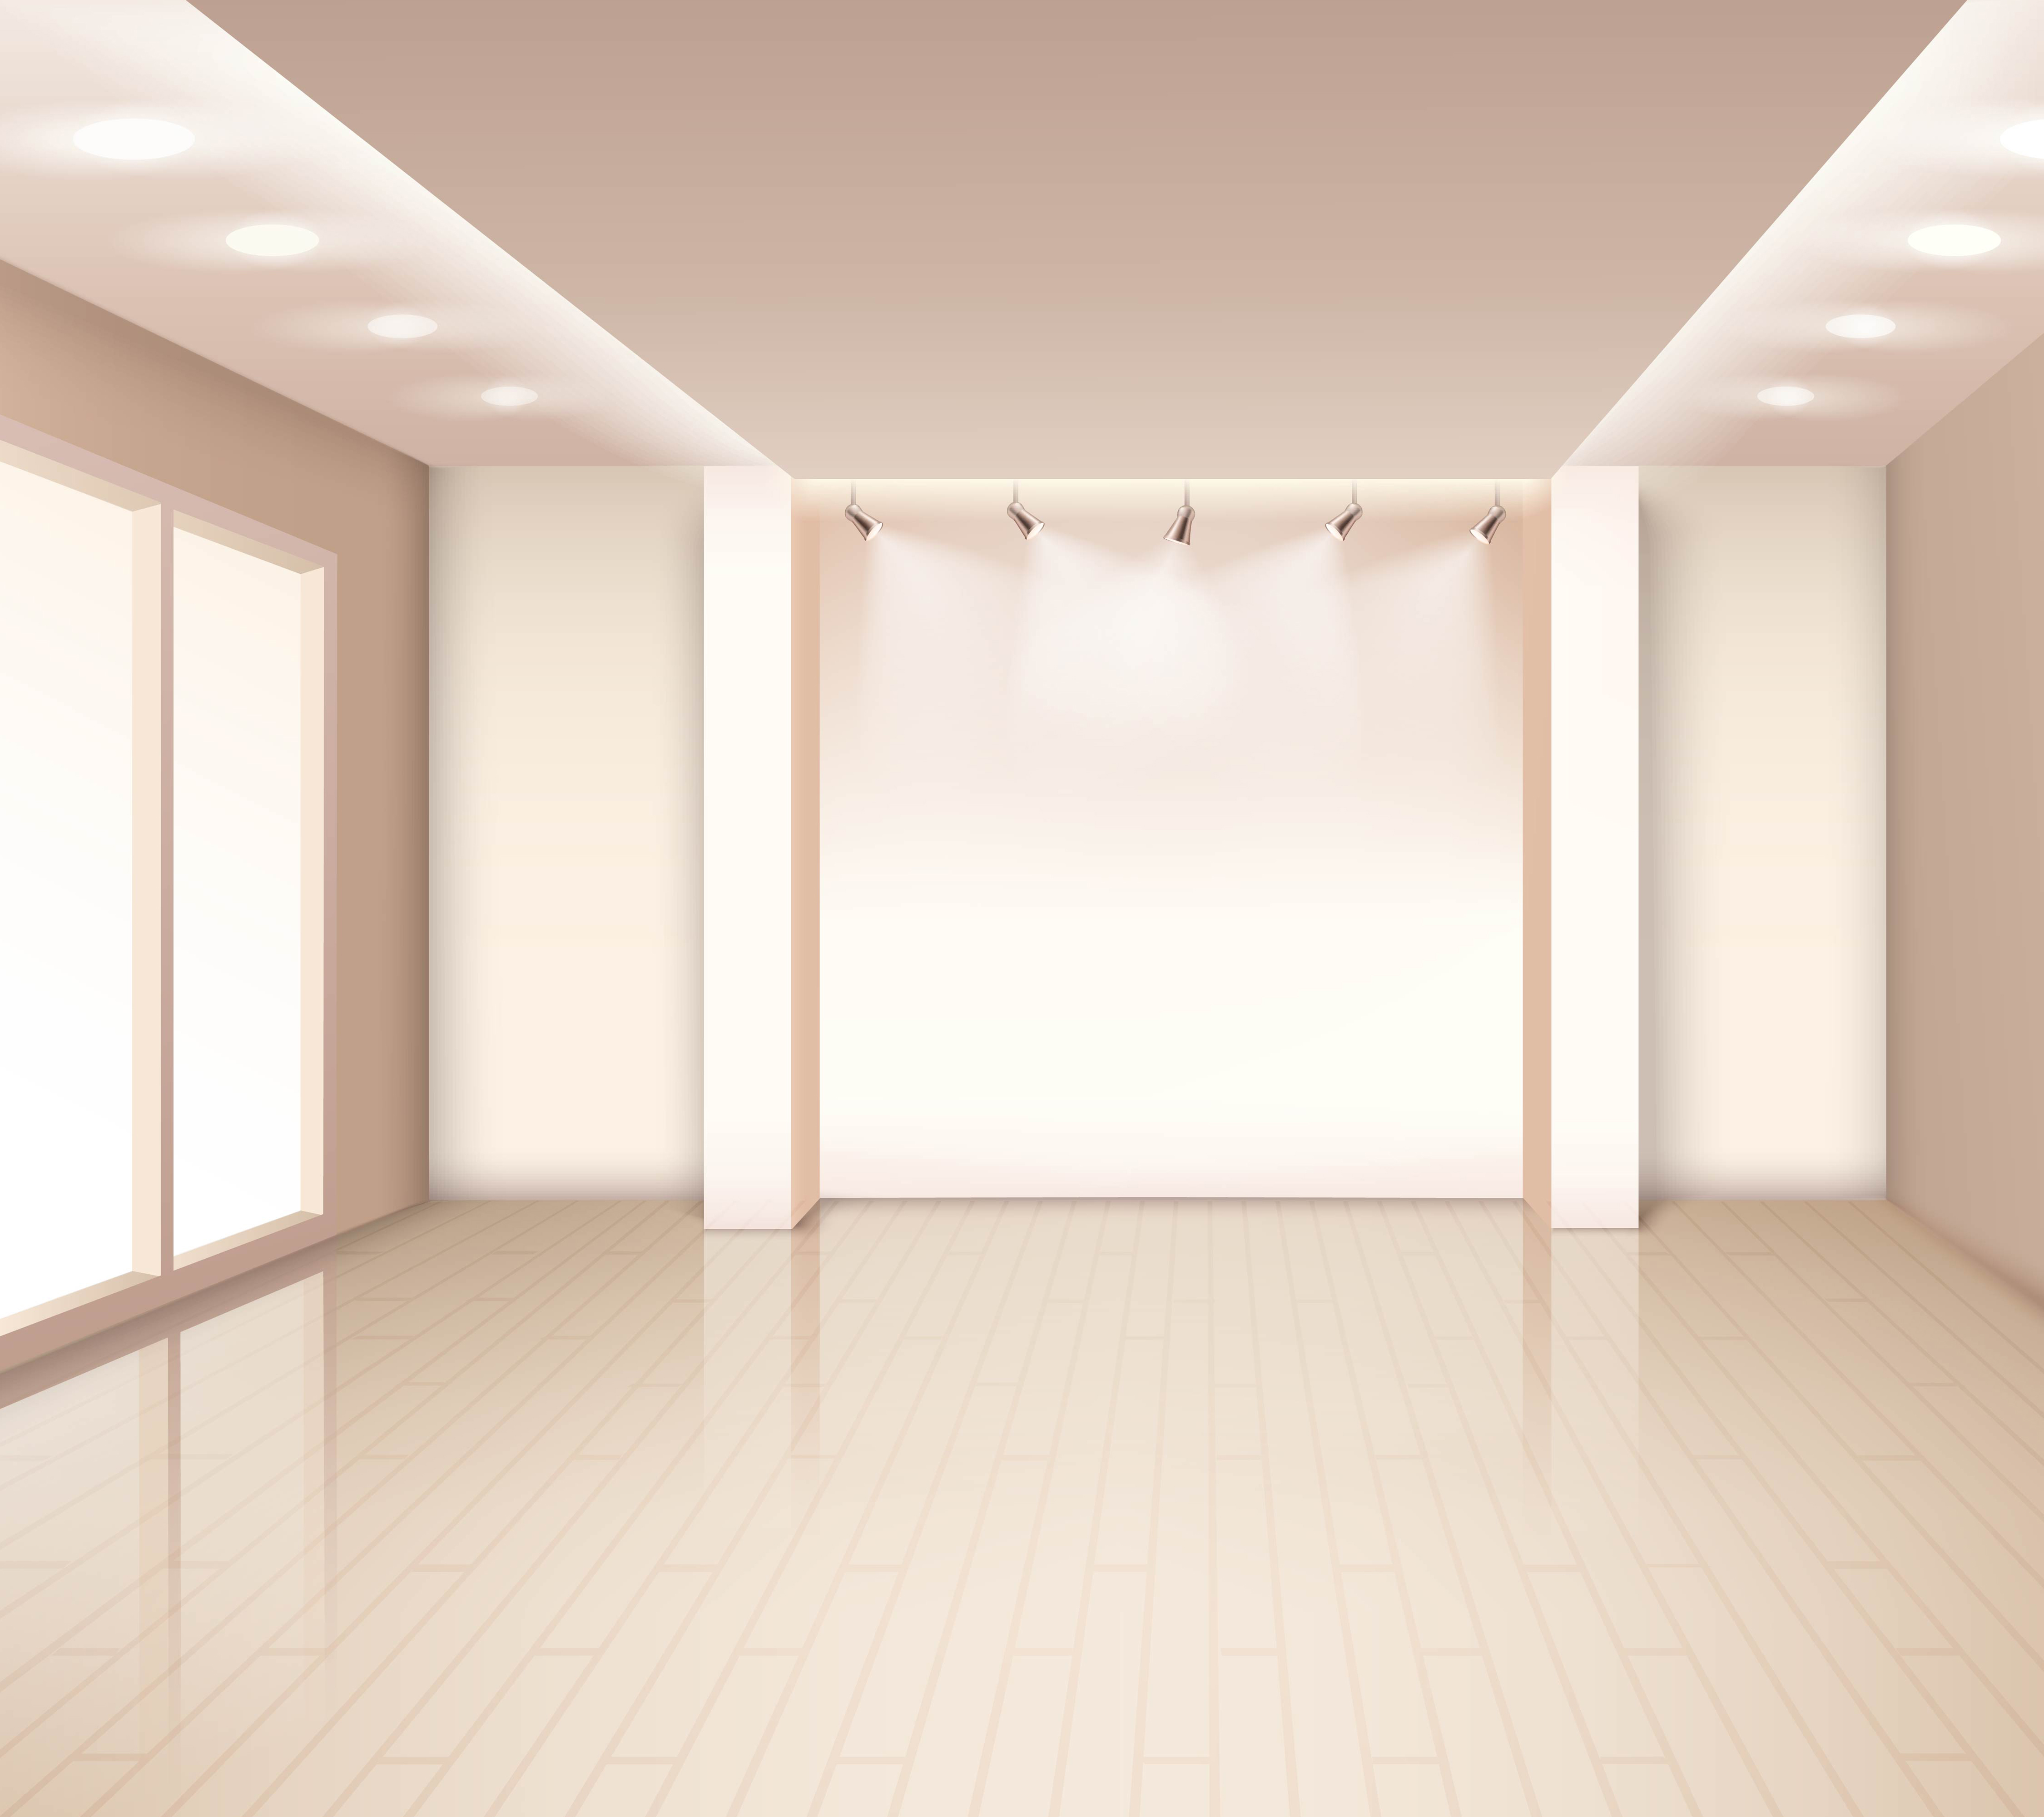 Empty Modern Room Interior Download Free Vectors Clipart Graphics Amp Vector Art